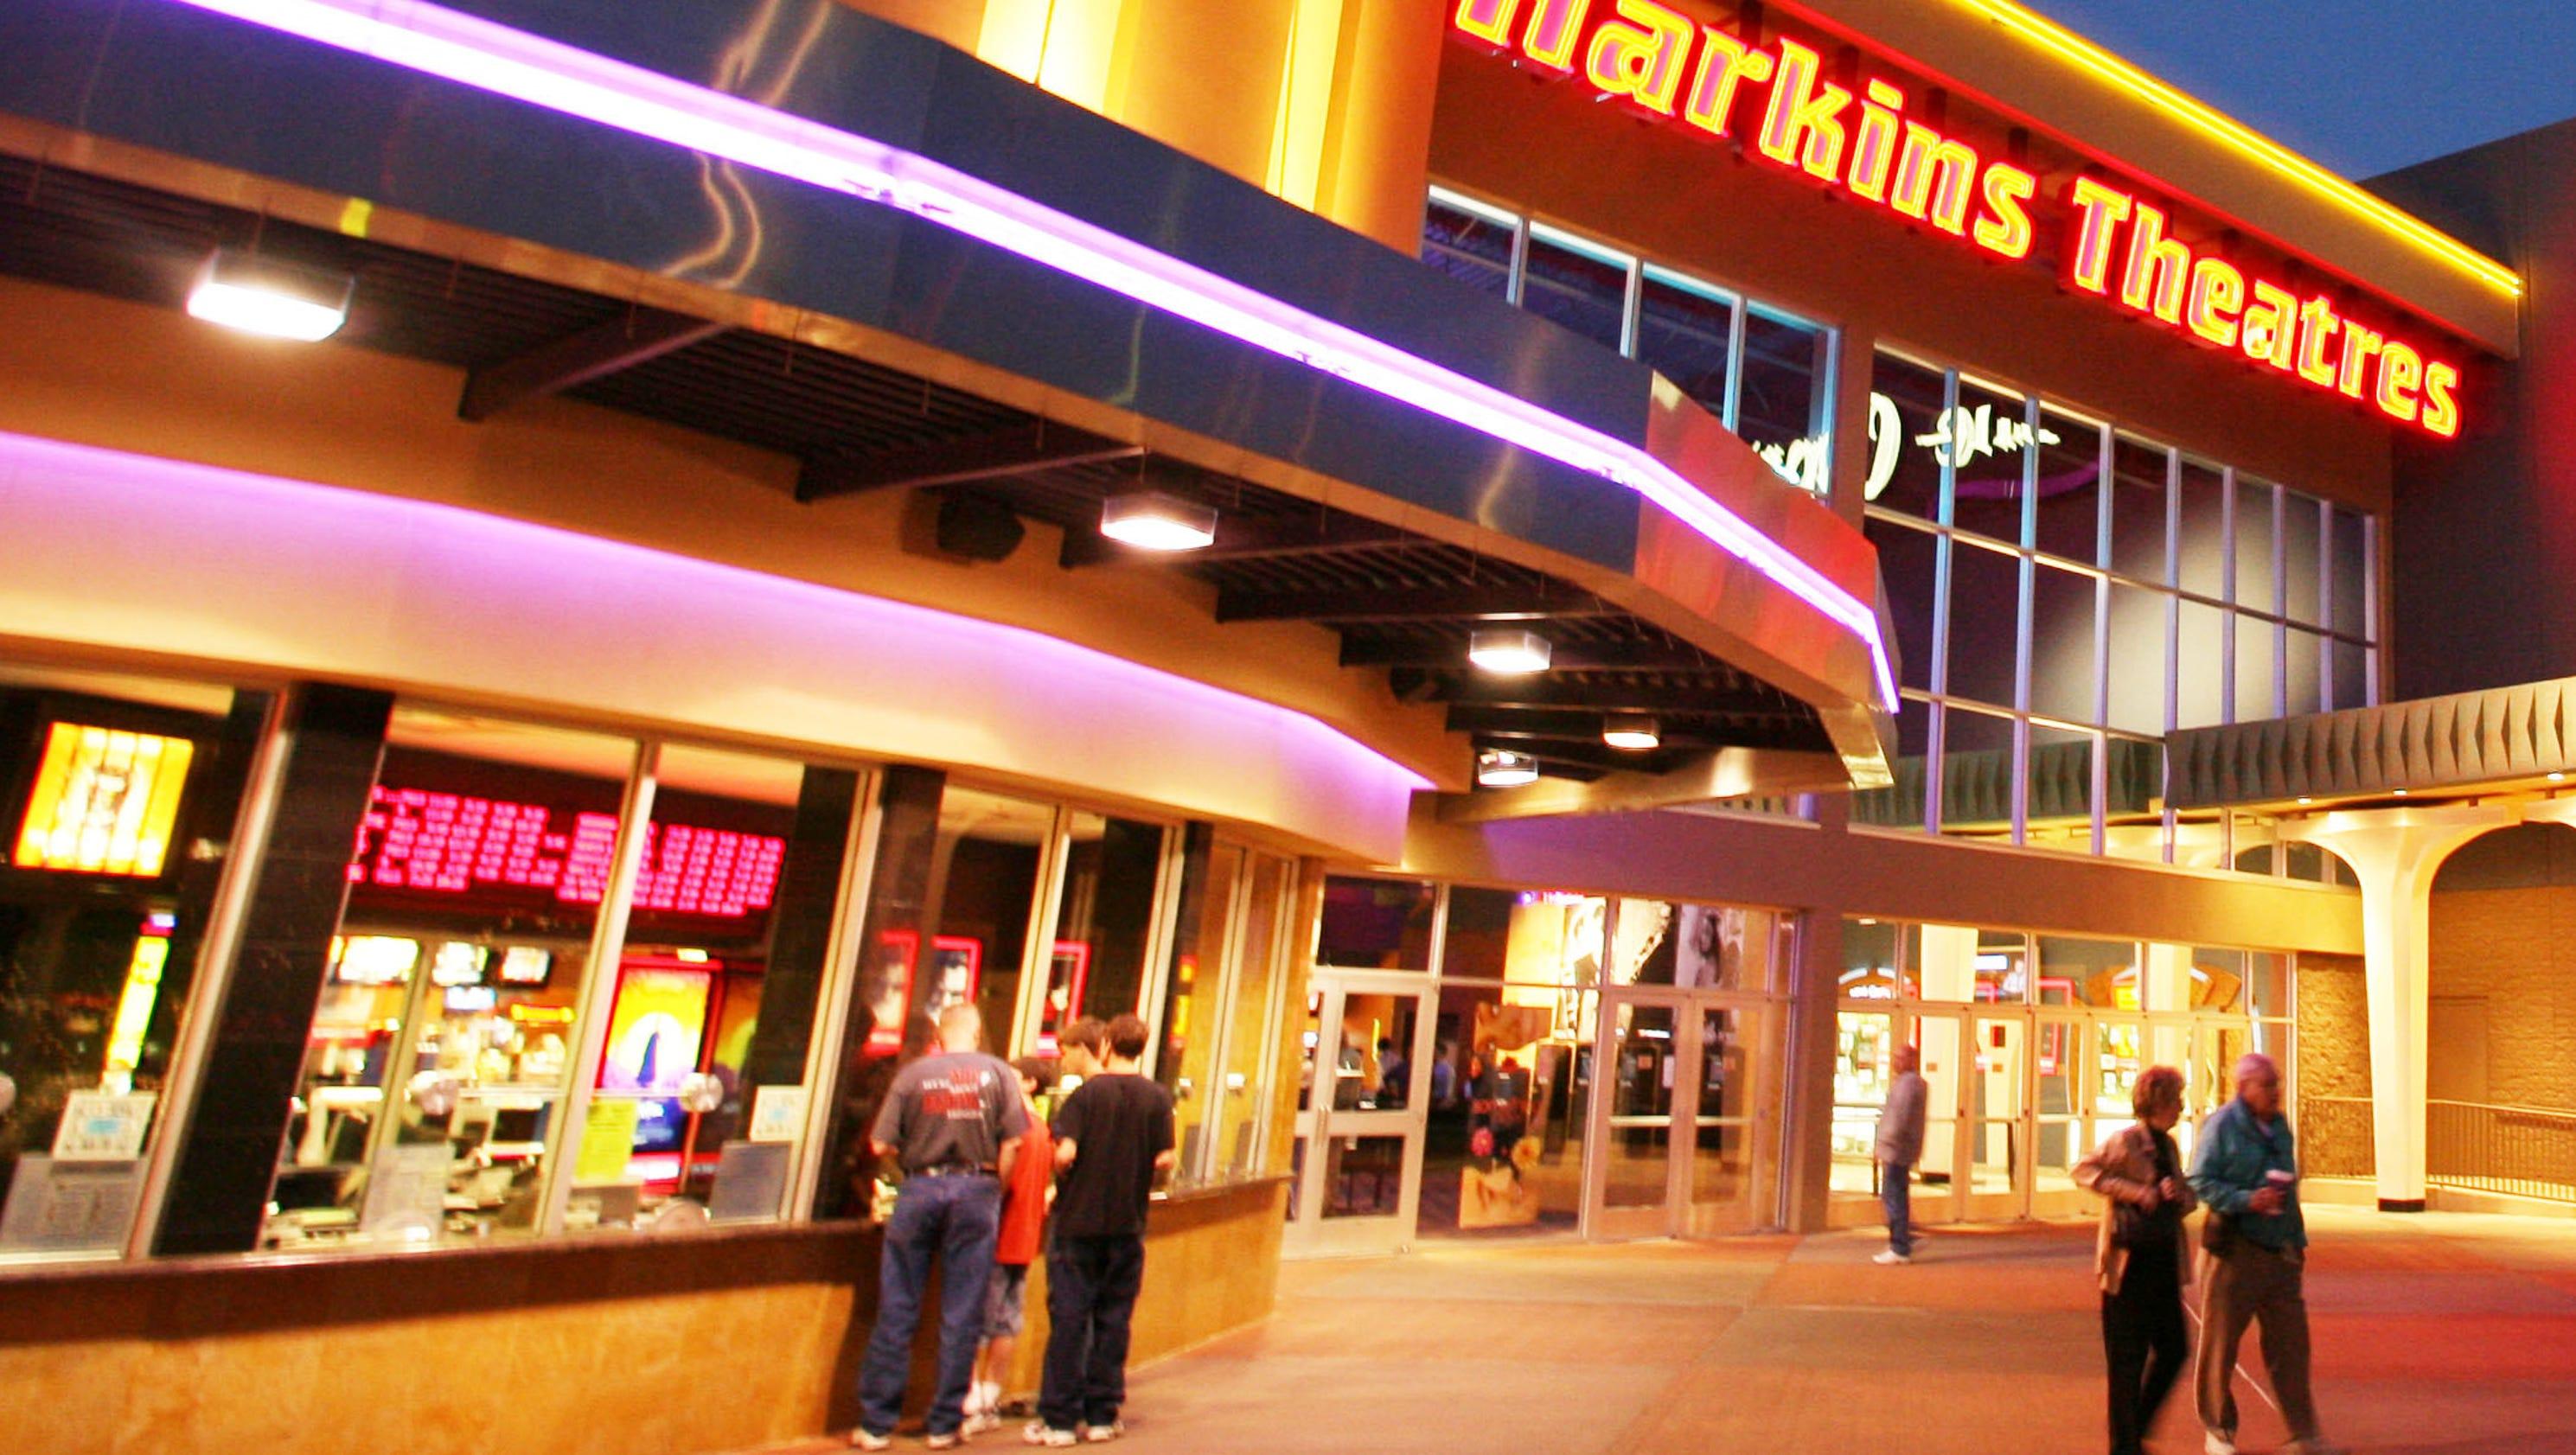 Fashion Square Harkins Movie Theater